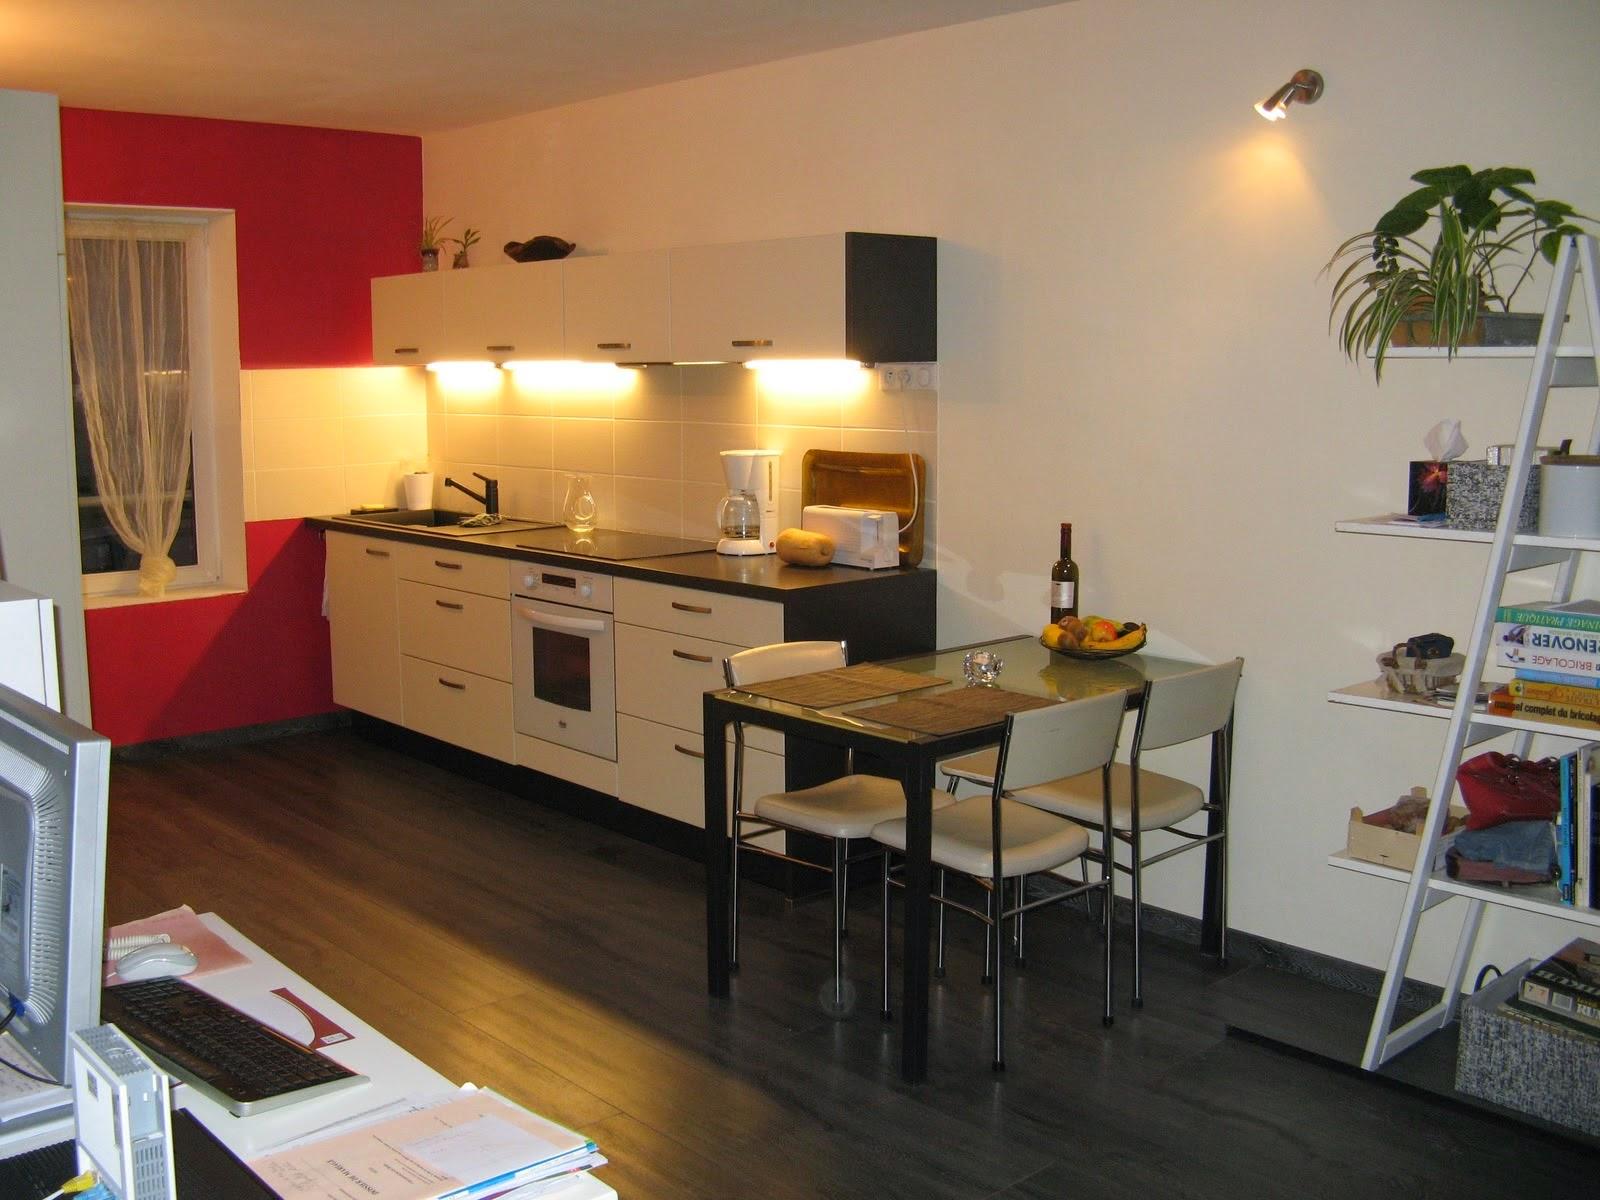 Renovation travaux peinture cuisine paris peintre professionnel cesu - Image peinture cuisine ...